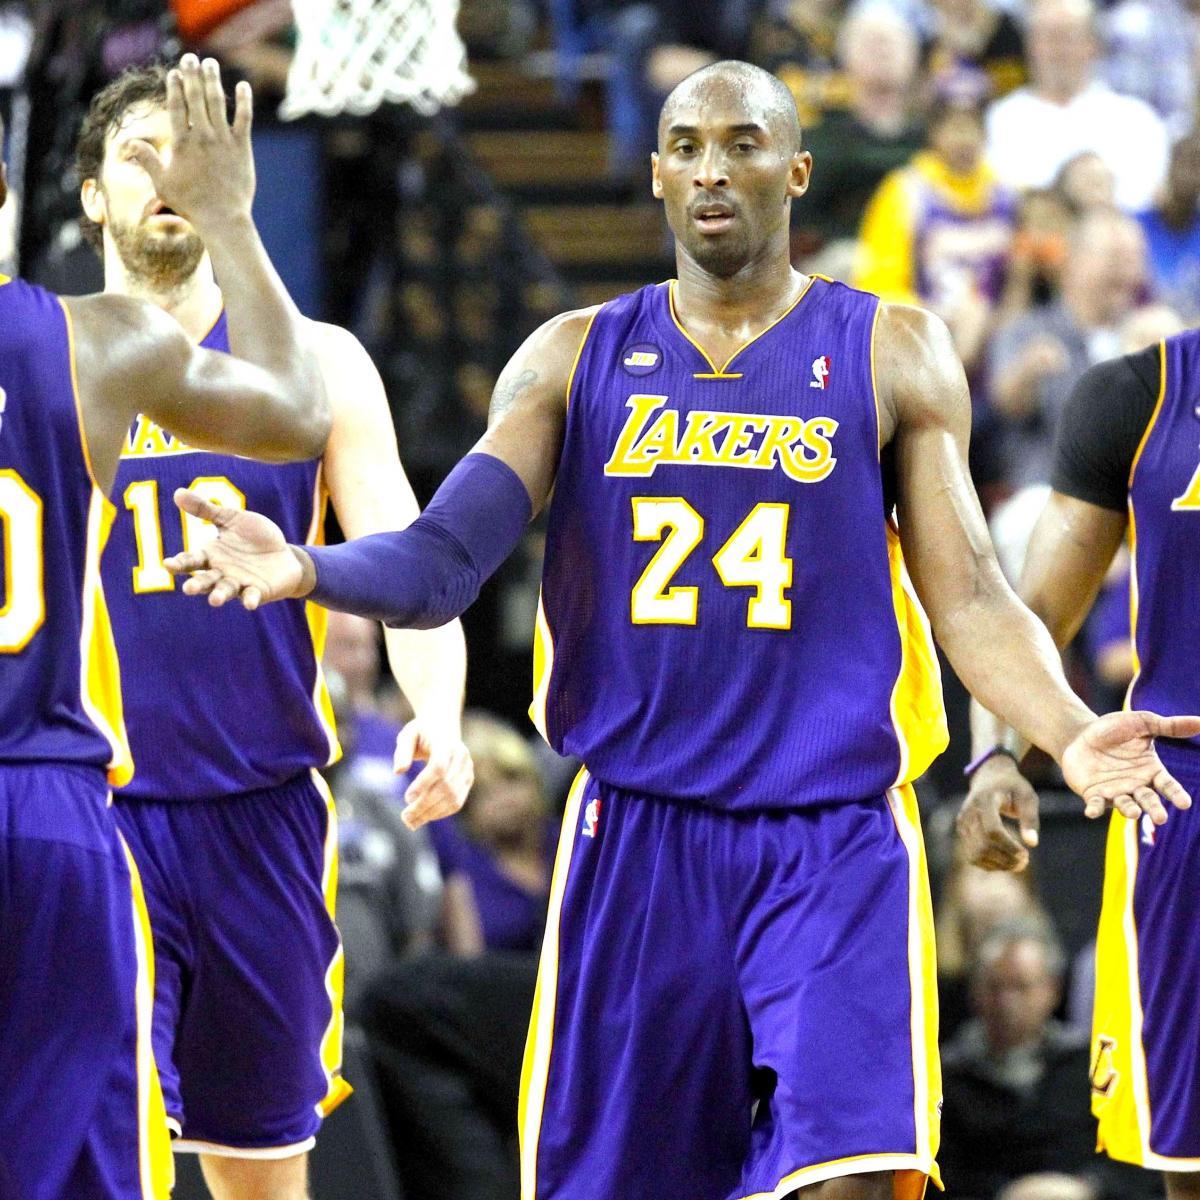 Portland Blazers Game Score: LA Lakers Vs. Portland Trail Blazers: Live Score, Results